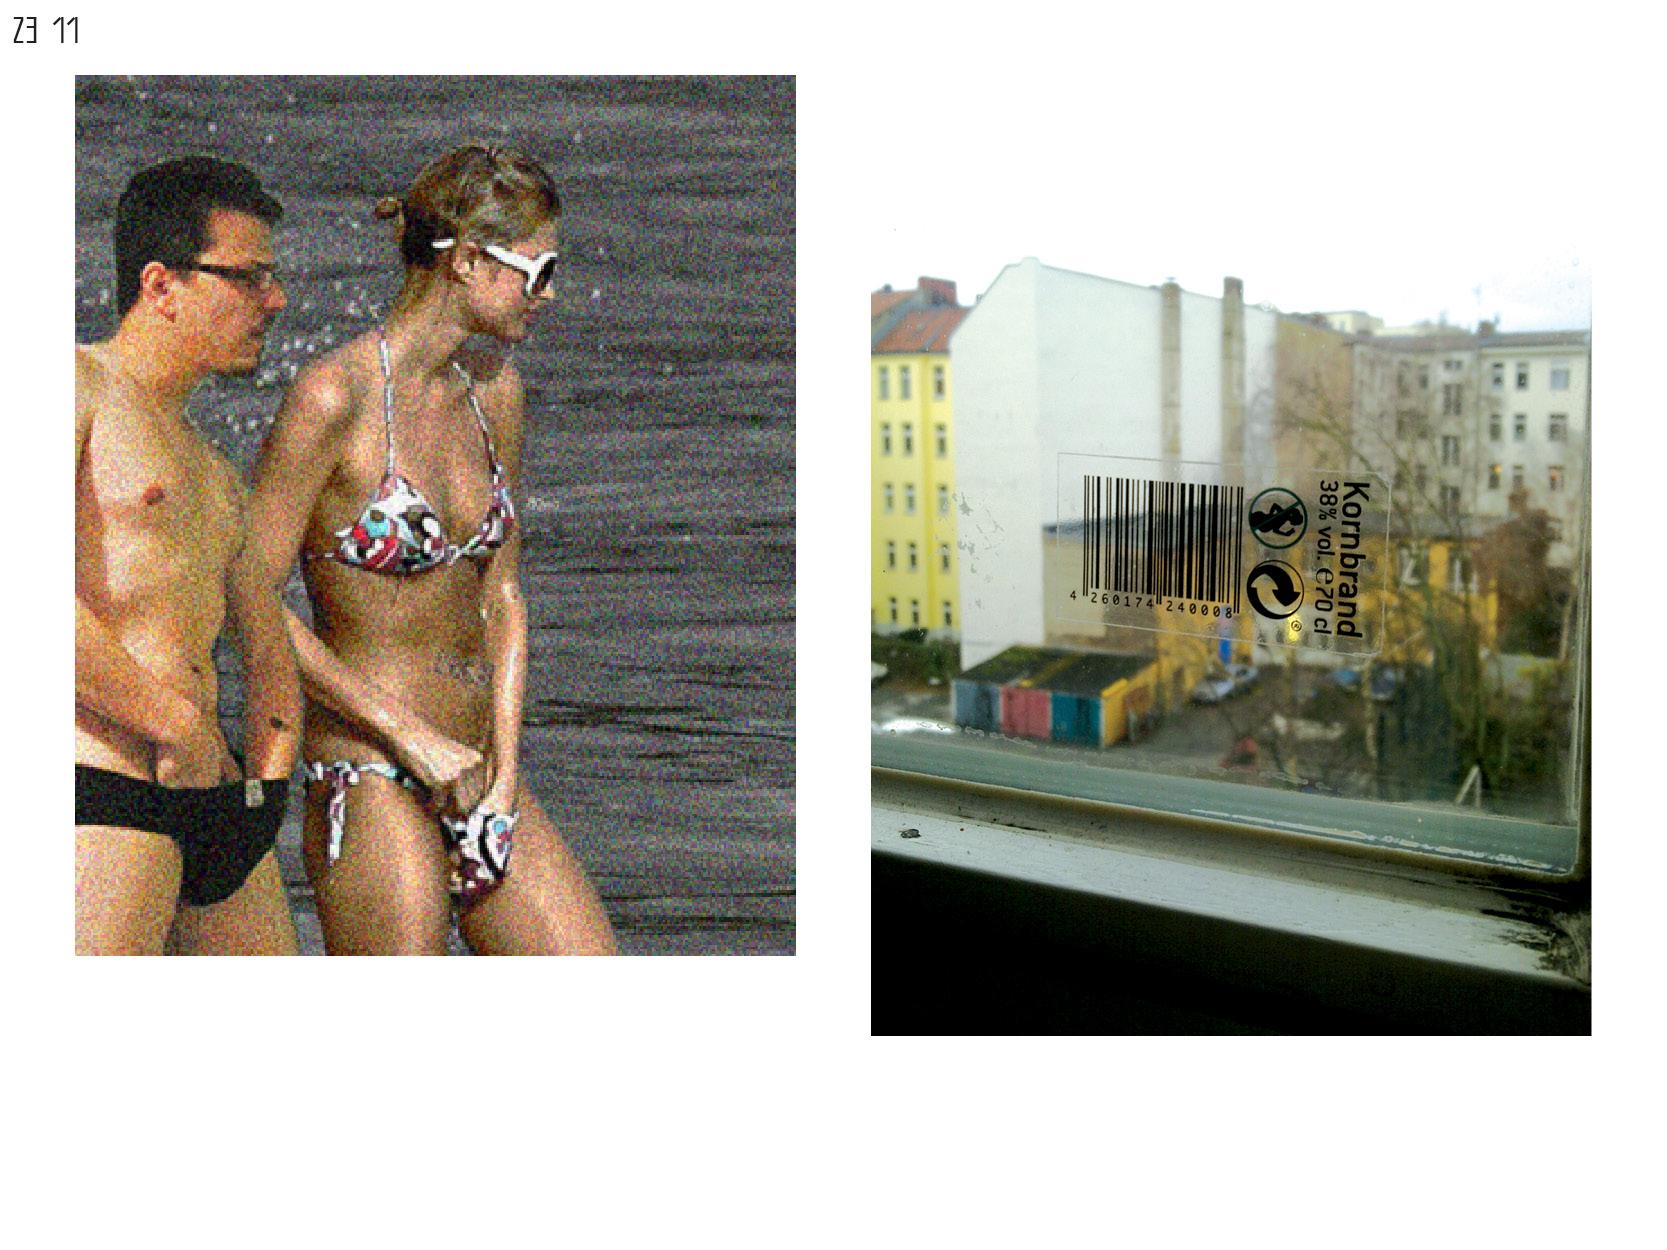 Gerrit-Schweiger-Dialog-Städte-Paris-Berlin-Jessica-Blank-Experiment-Fotoserie-Tagebuch-visuelle-Kommunikation-38